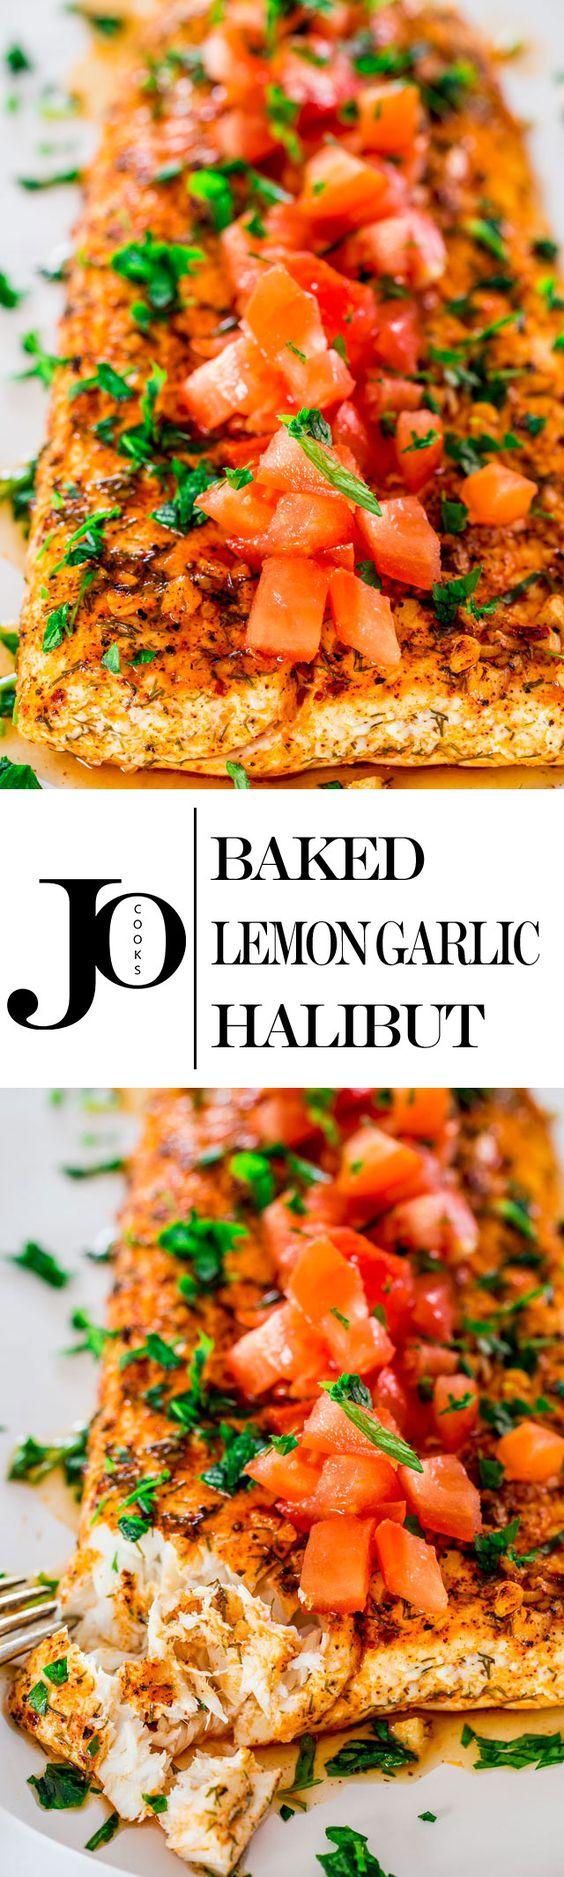 tasty lemon baked lemon and more halibut garlic clean eating lemon ...